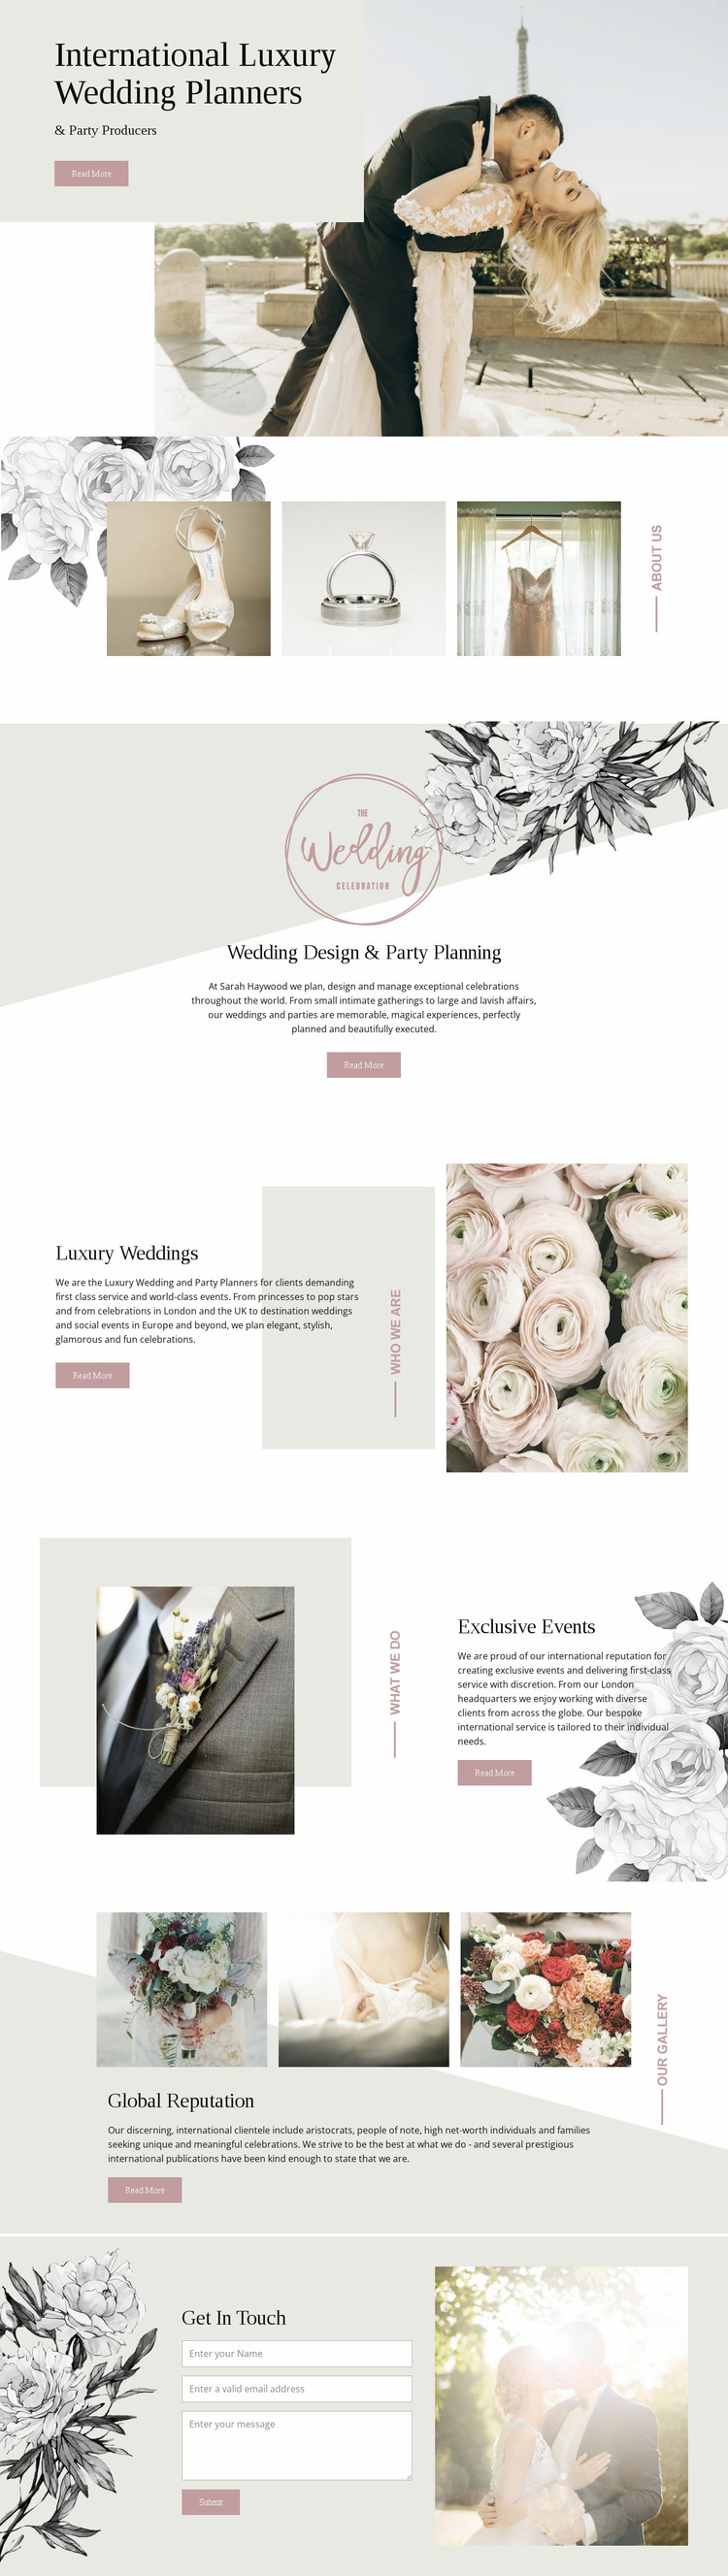 Planners of luxury wedding Website Mockup